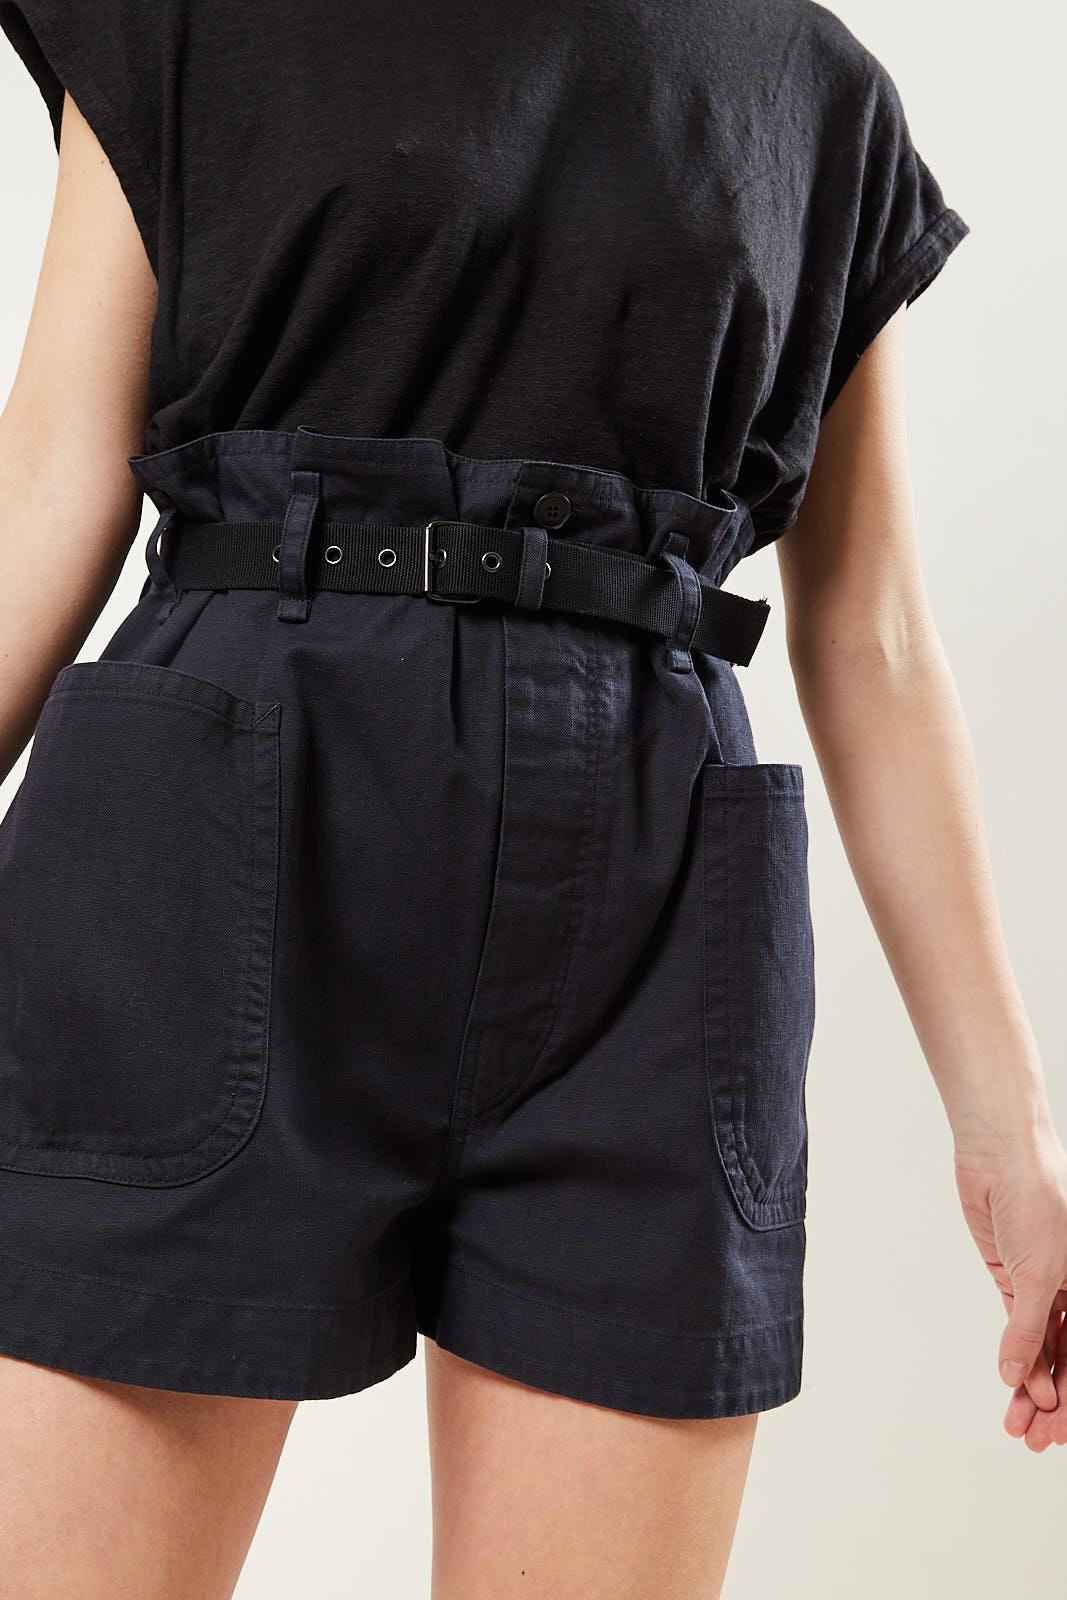 Etoile Isabel Marant - Rike cotton trench short black 02fk